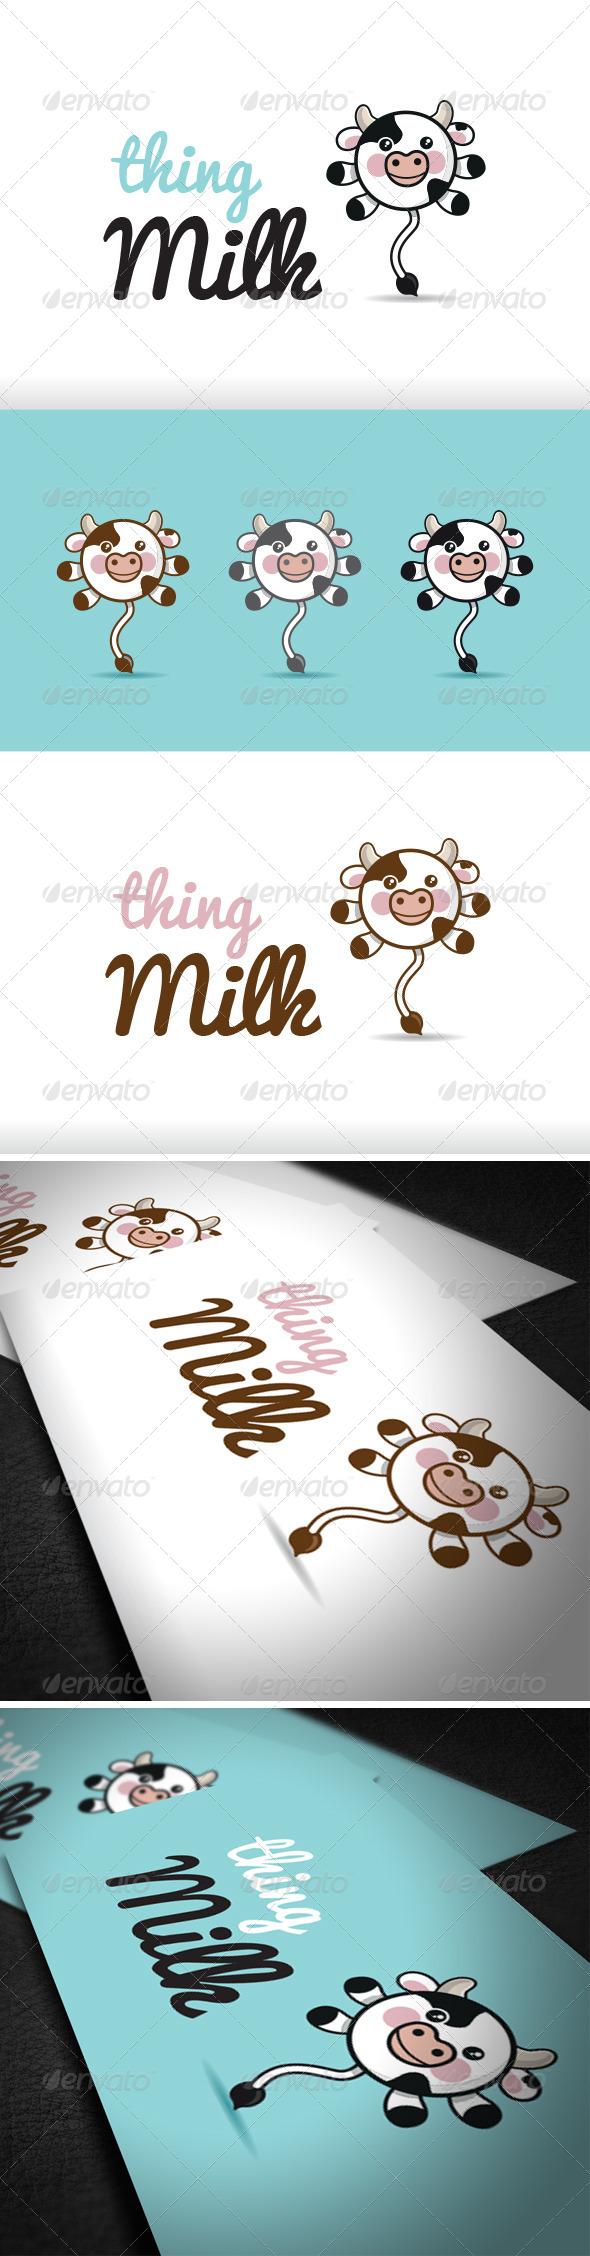 Thing Milk Logo Template